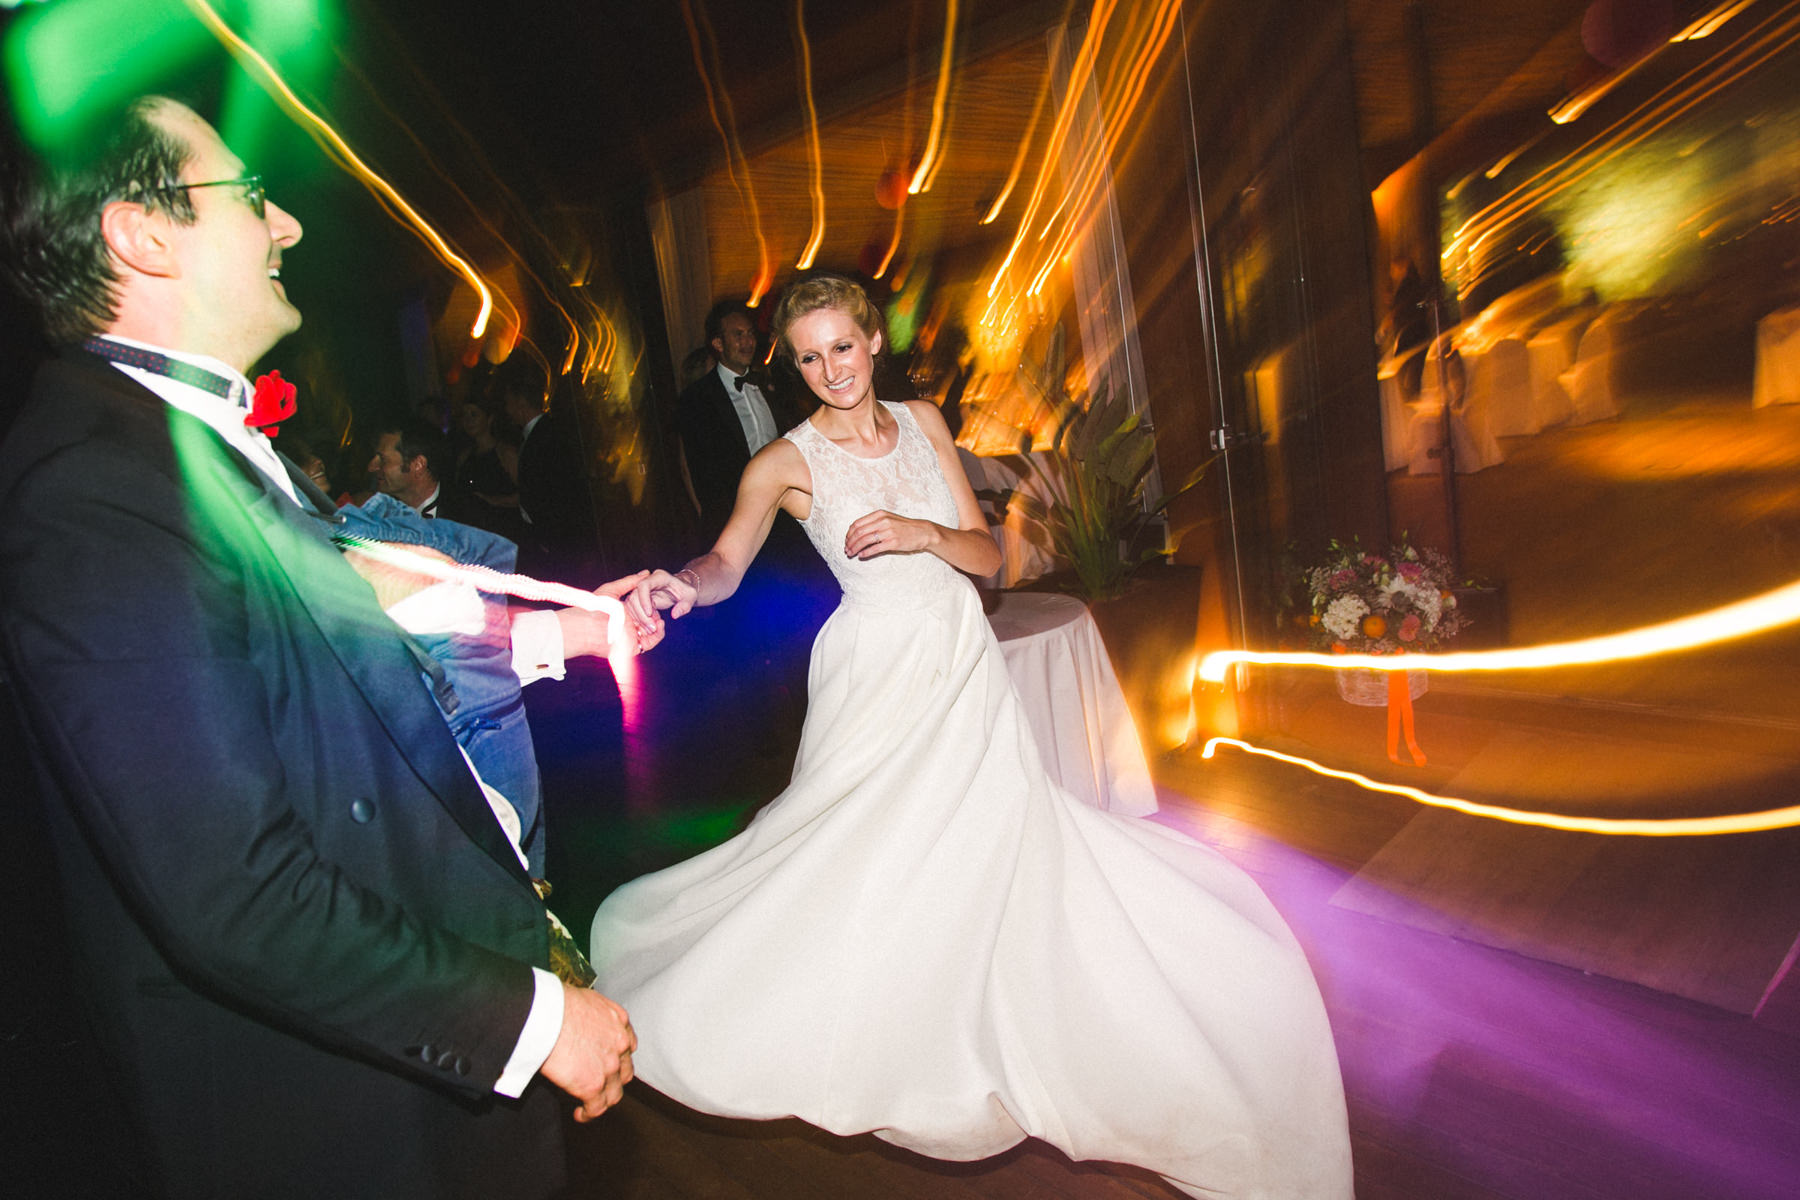 Wedding_Photography_Carlos_Hevia_Barcelona_Berlin_52.jpg